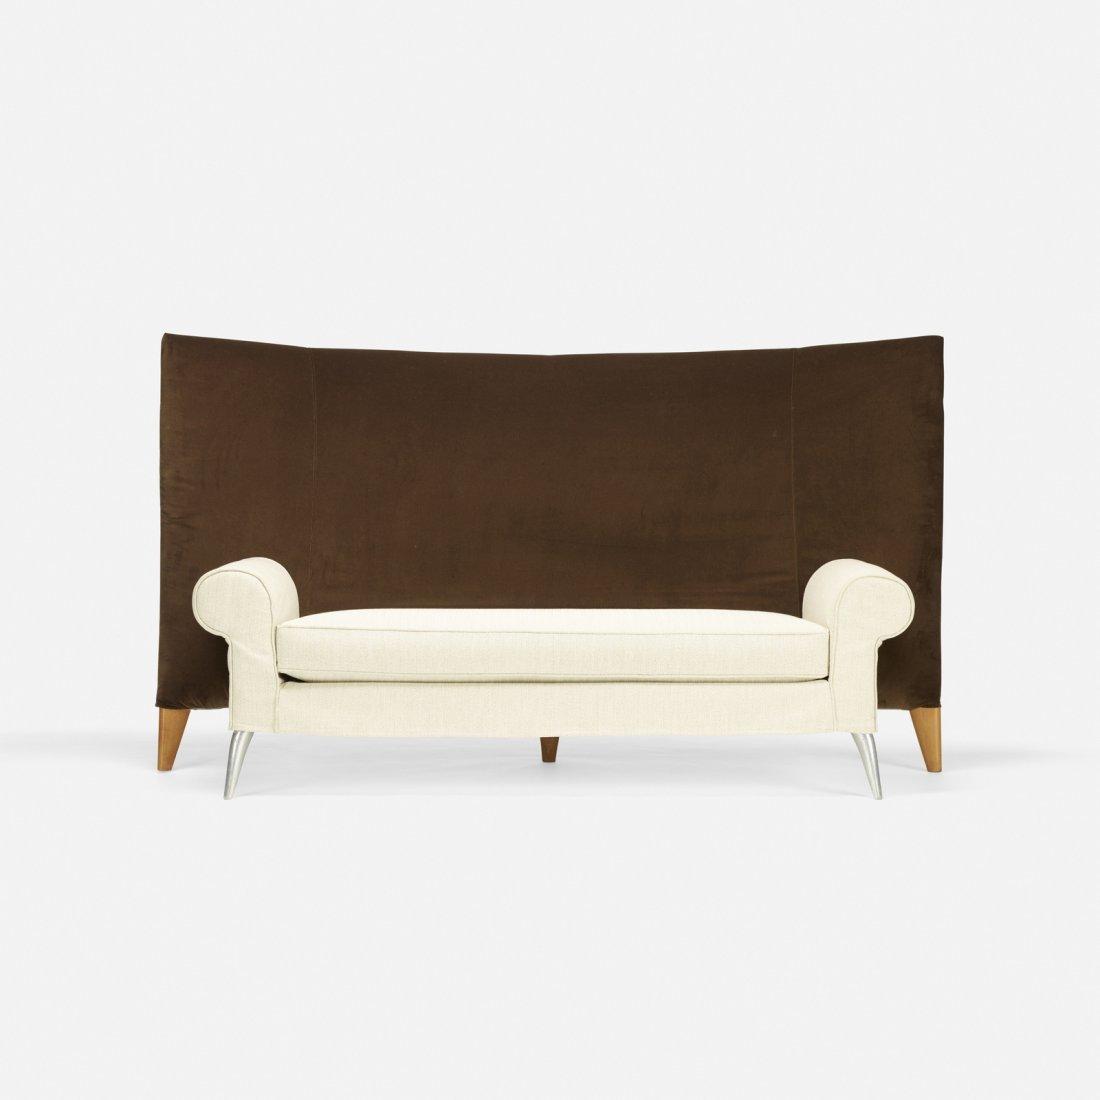 Philippe Starck, Royalton sofa - 2